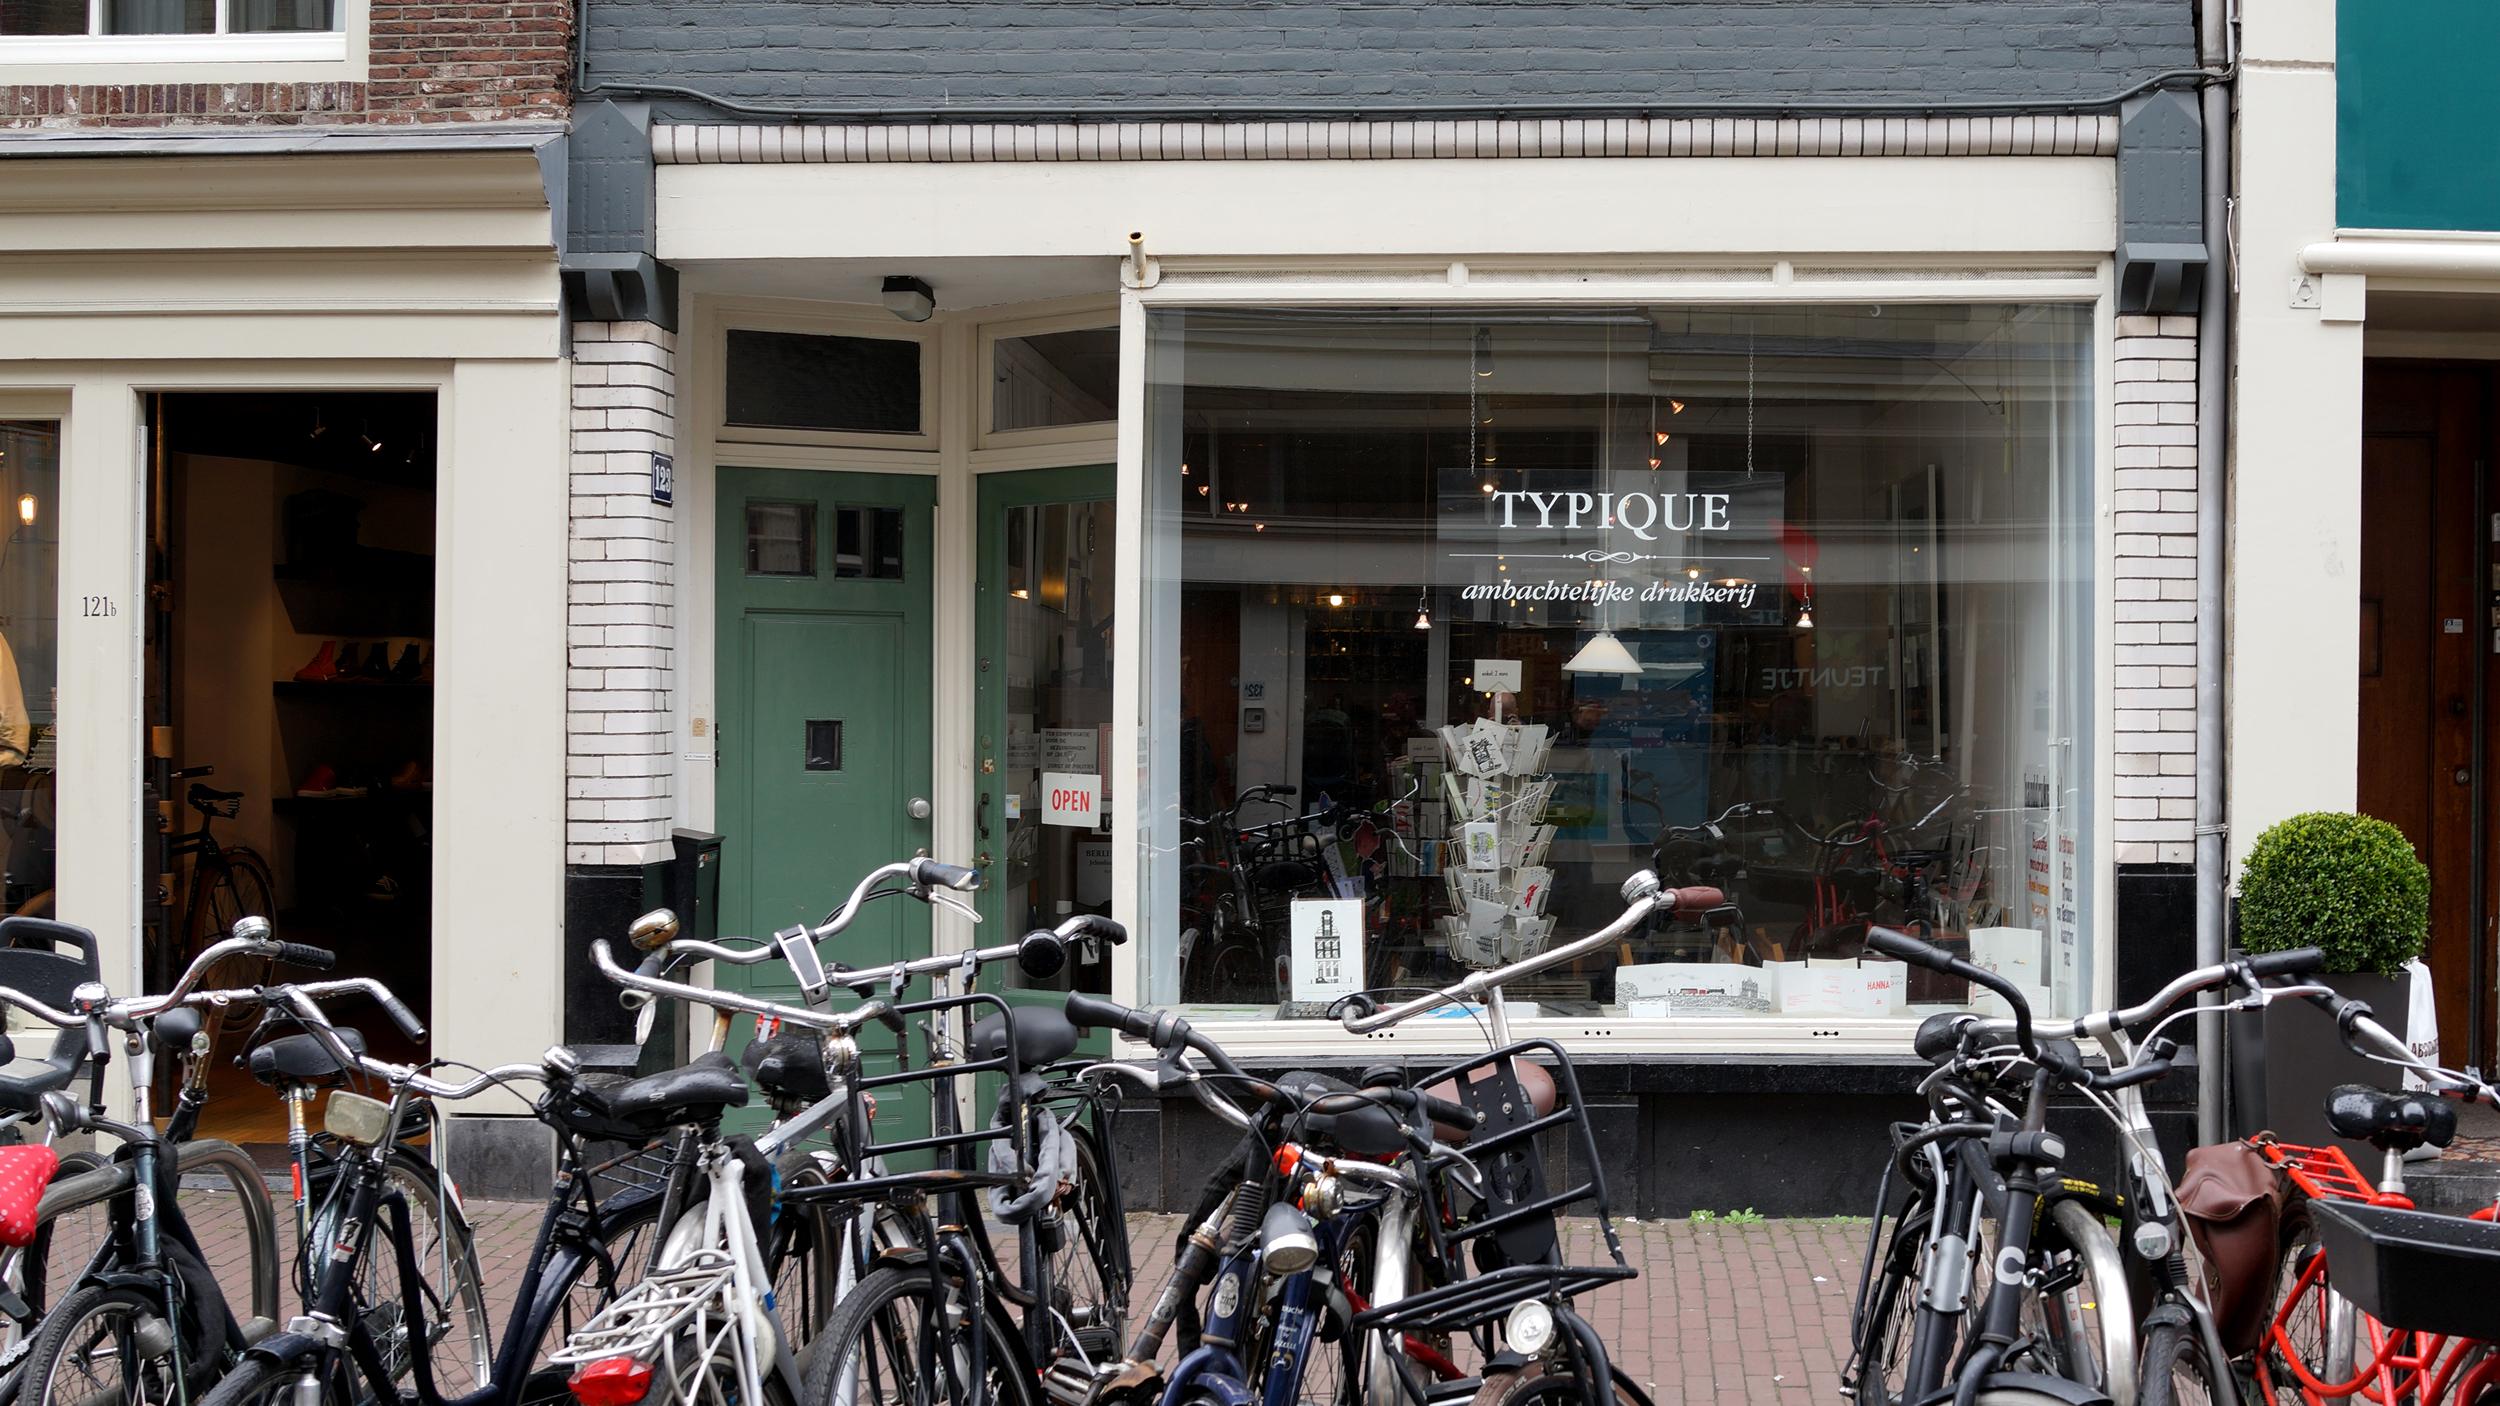 Typique letterpress shop, Amsterdam